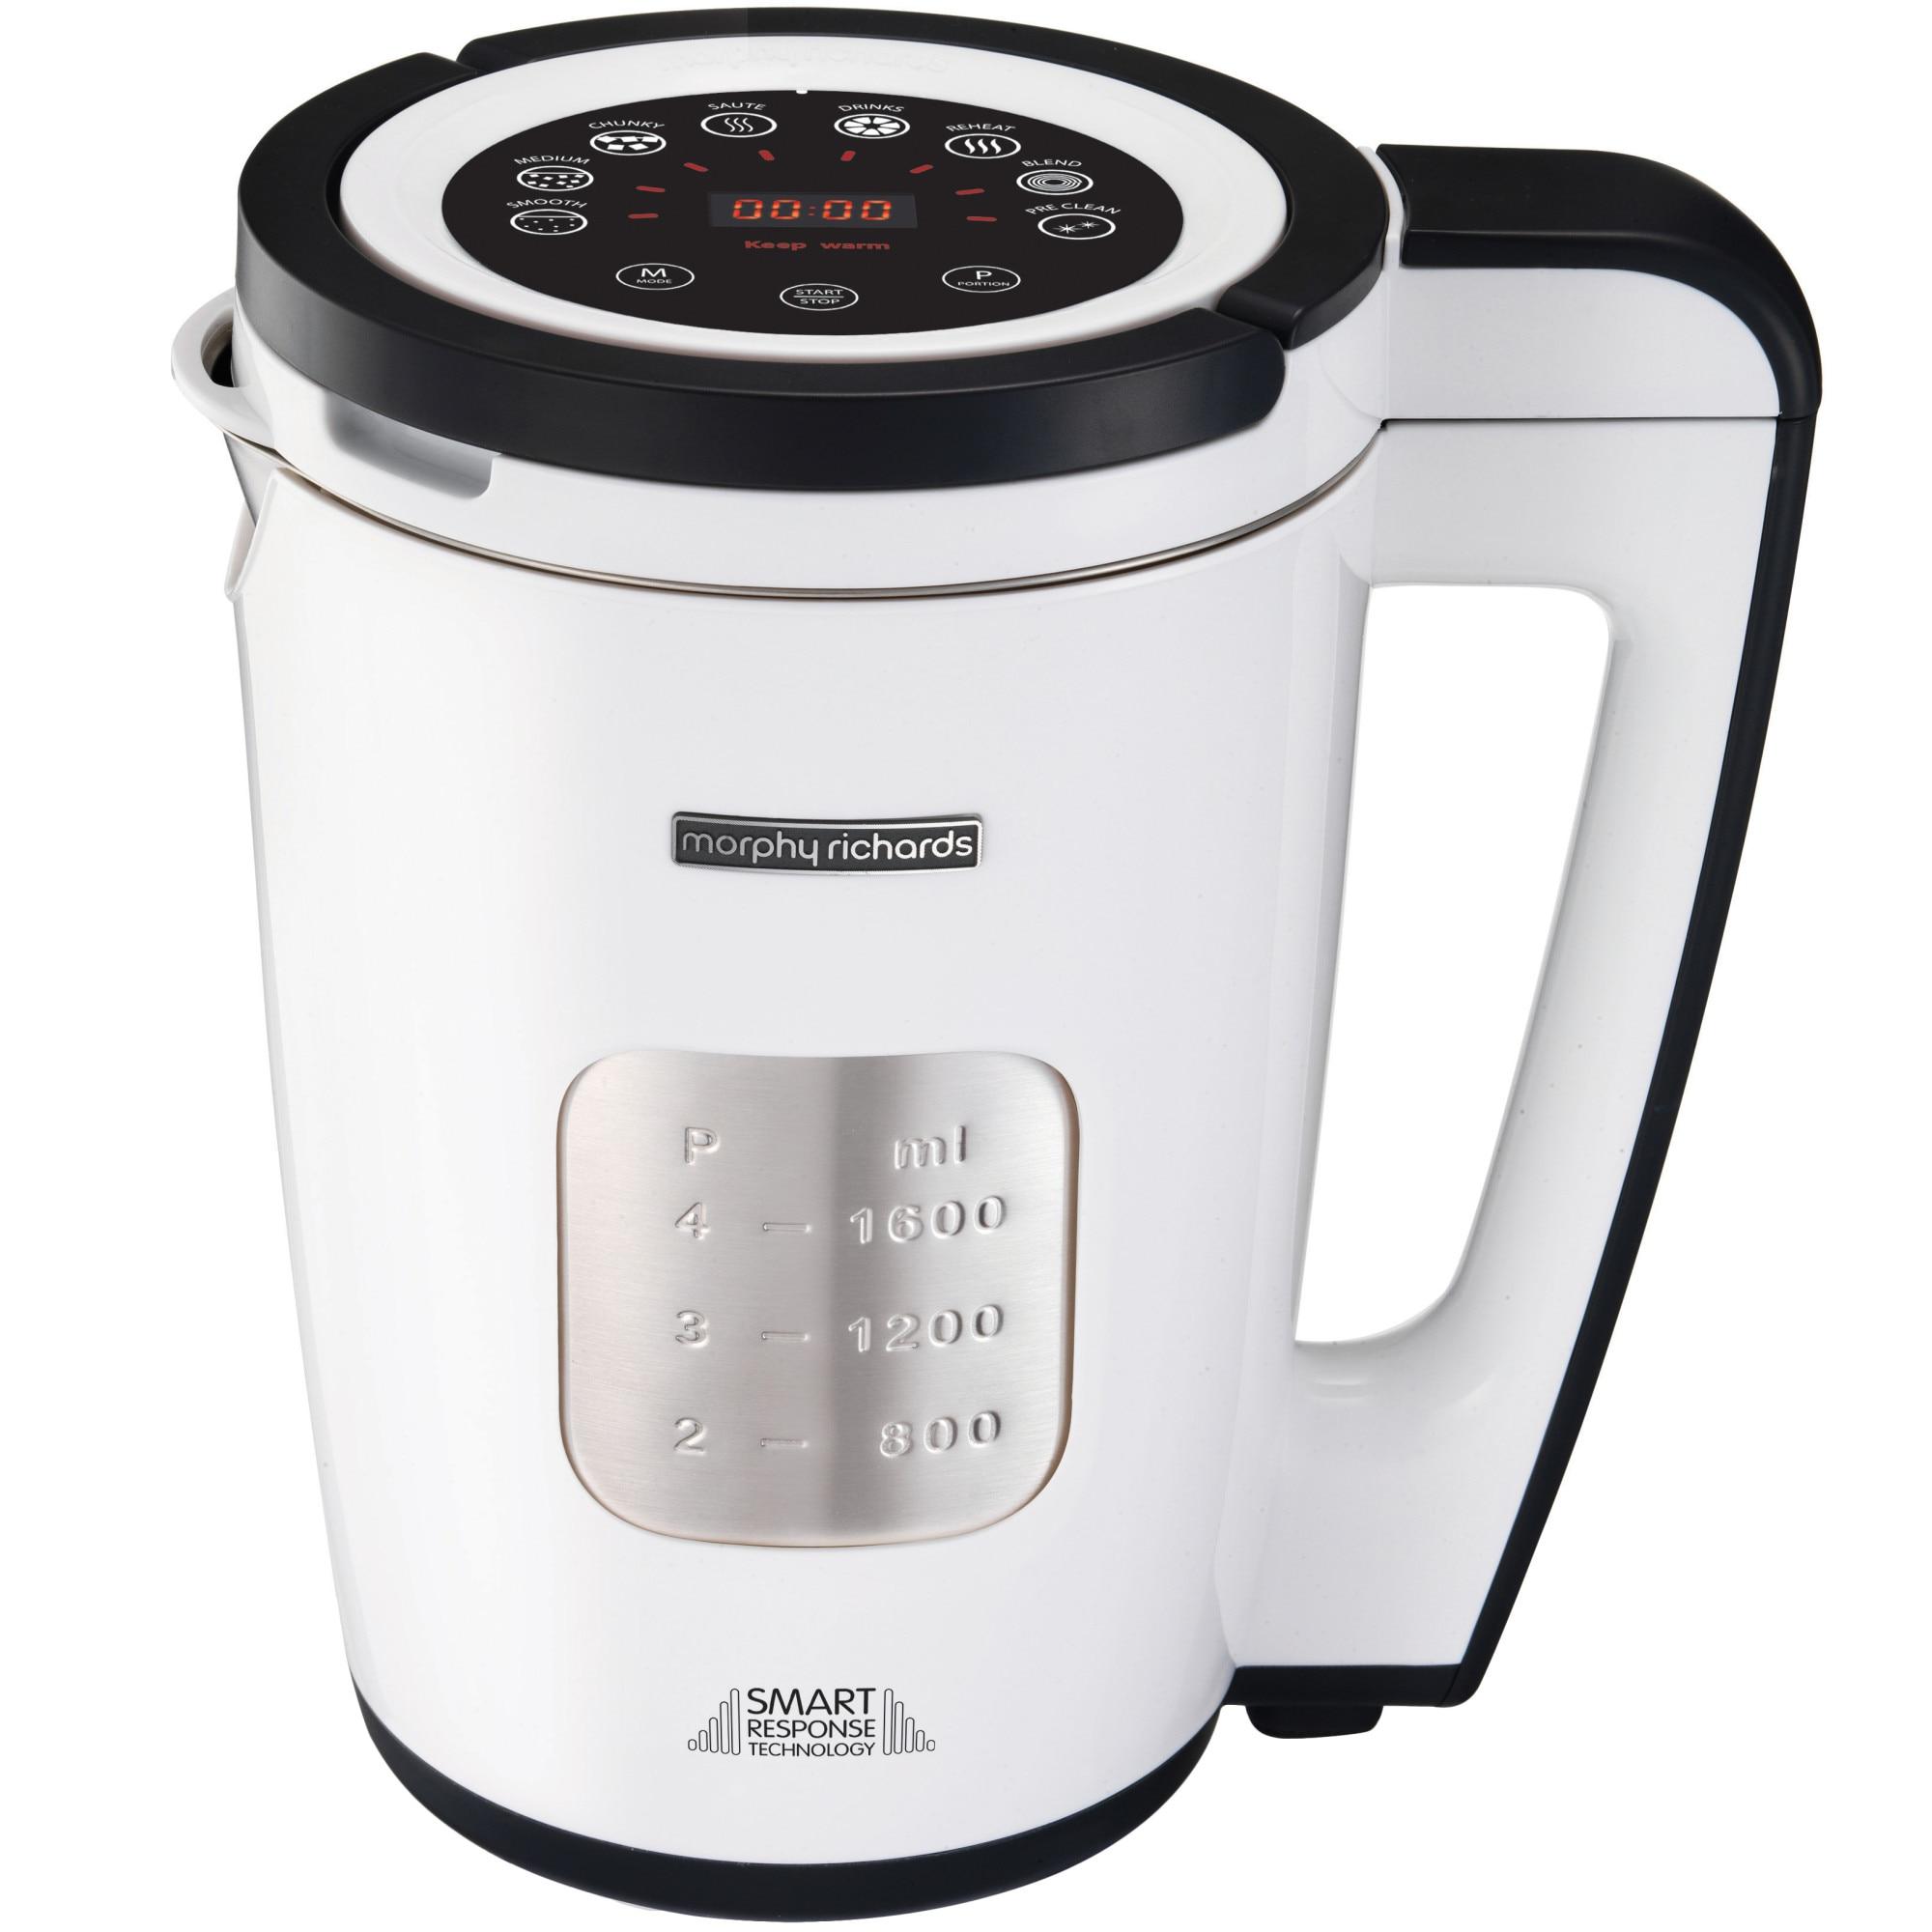 Fotografie Aparat preparat supa crema Morphy Richards 501020 Total Control Soup Maker 1100 W ,1,6 litri, 8 functii, Alb